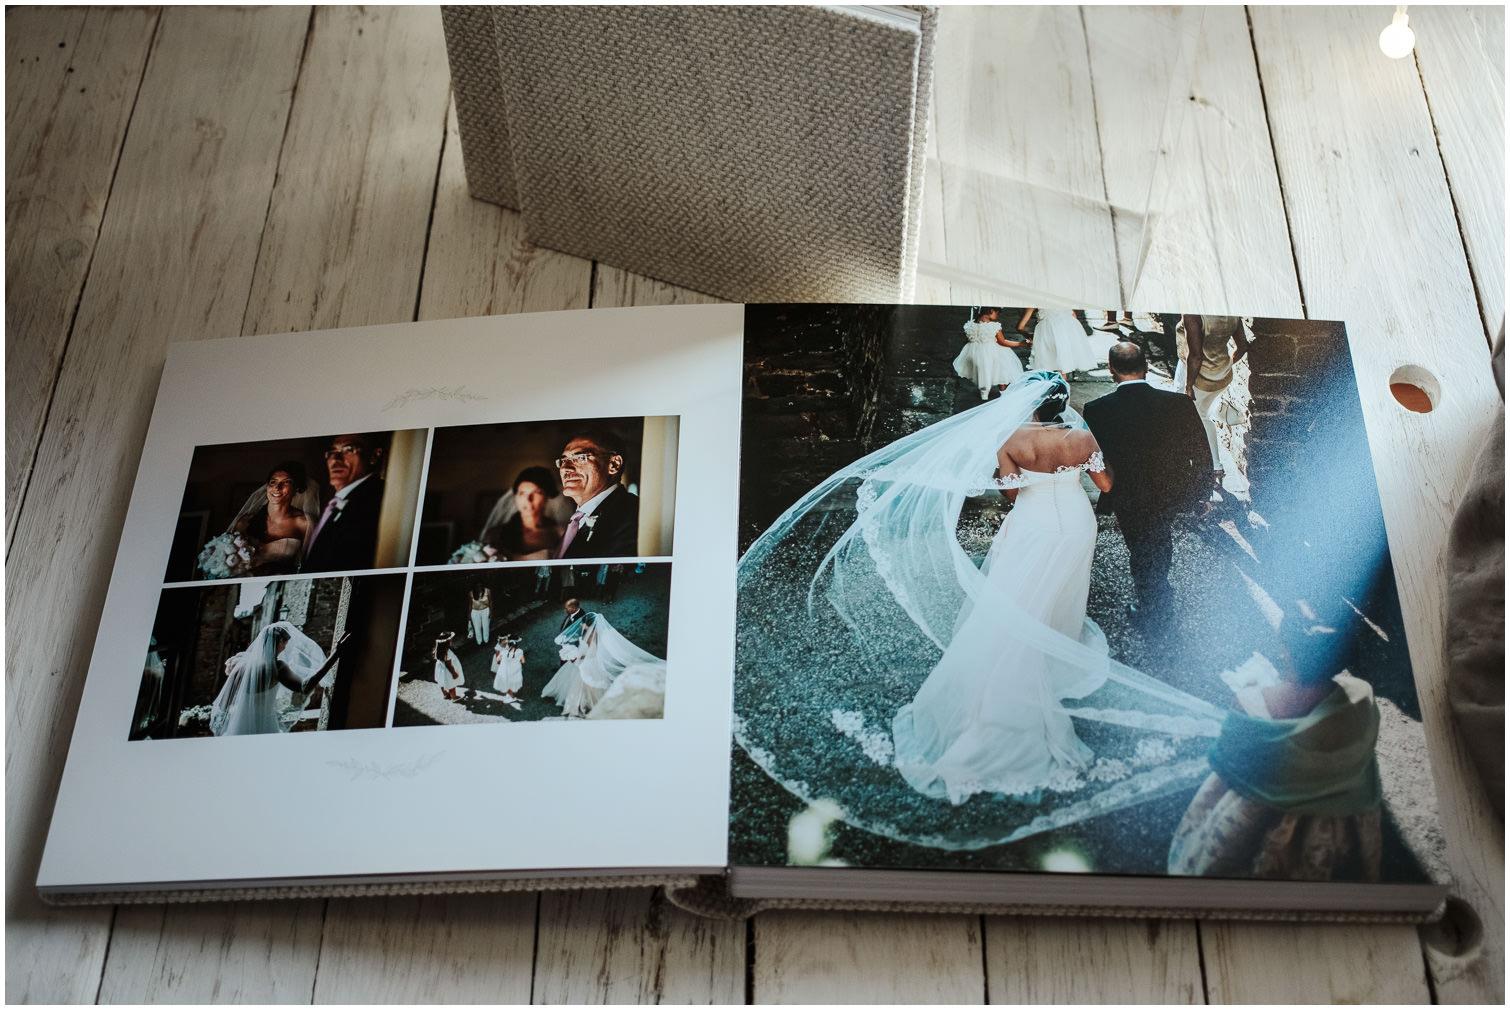 SARA-LORENZONI-FOTOGRAFIA-LETIZIA-MICHELE-JEWEL-BOOK-8